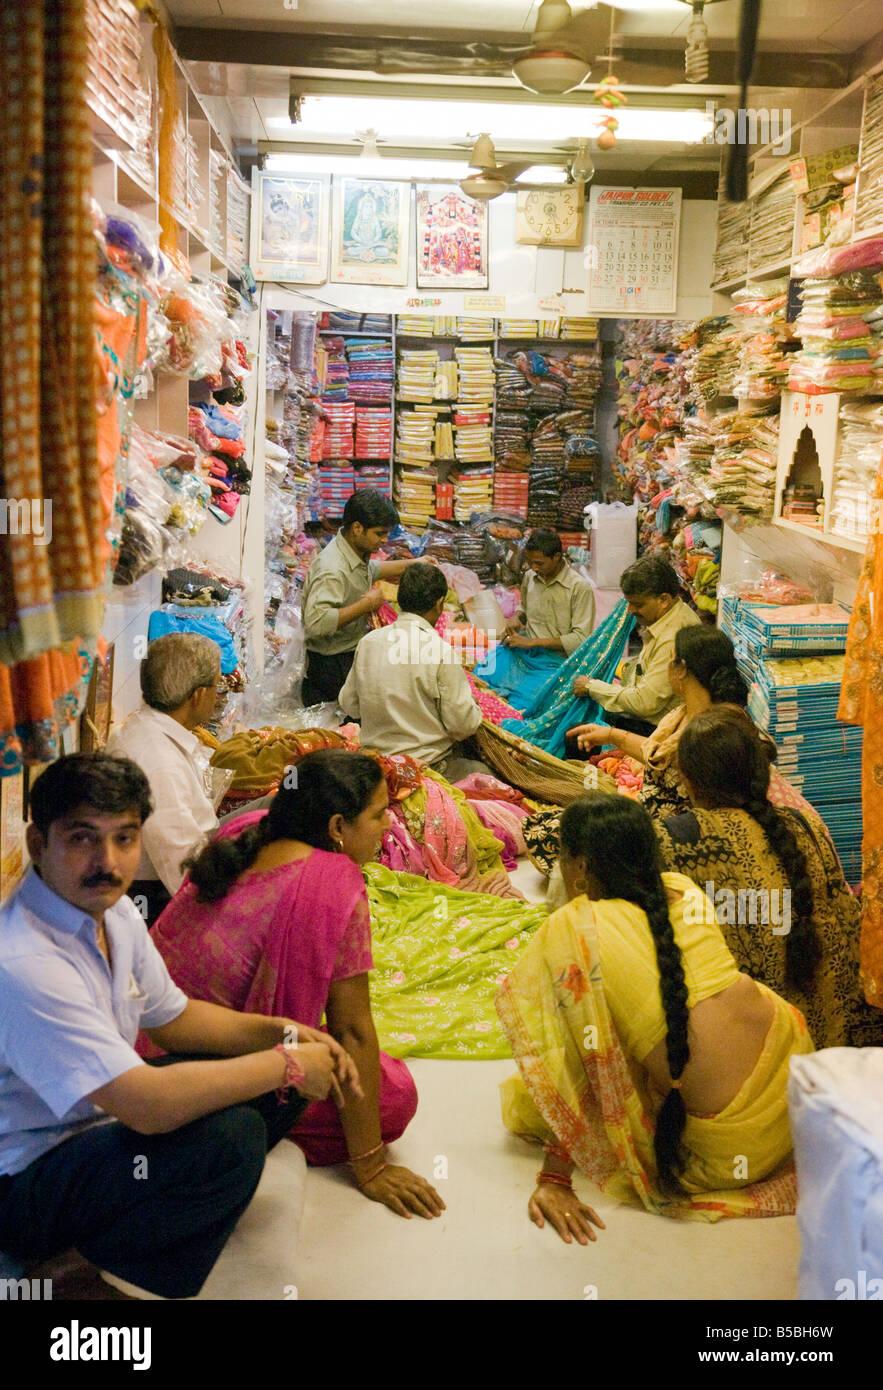 3a8e54f627 Women shopping and buying saris in a sari shop in the Kinari market, Old  Delhi India